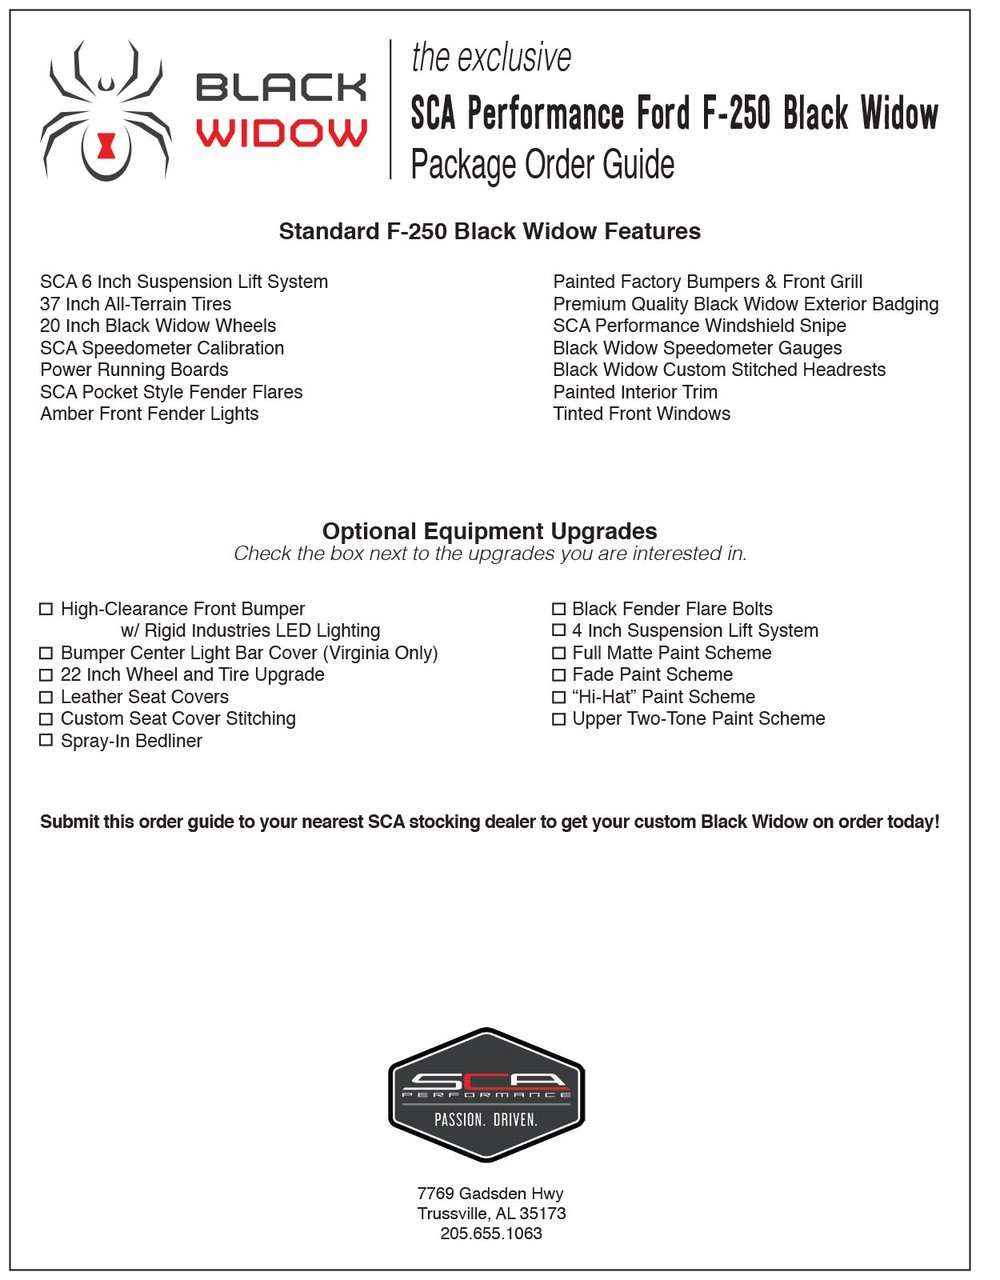 Ford F250 Black Widow Order Guide.jpg